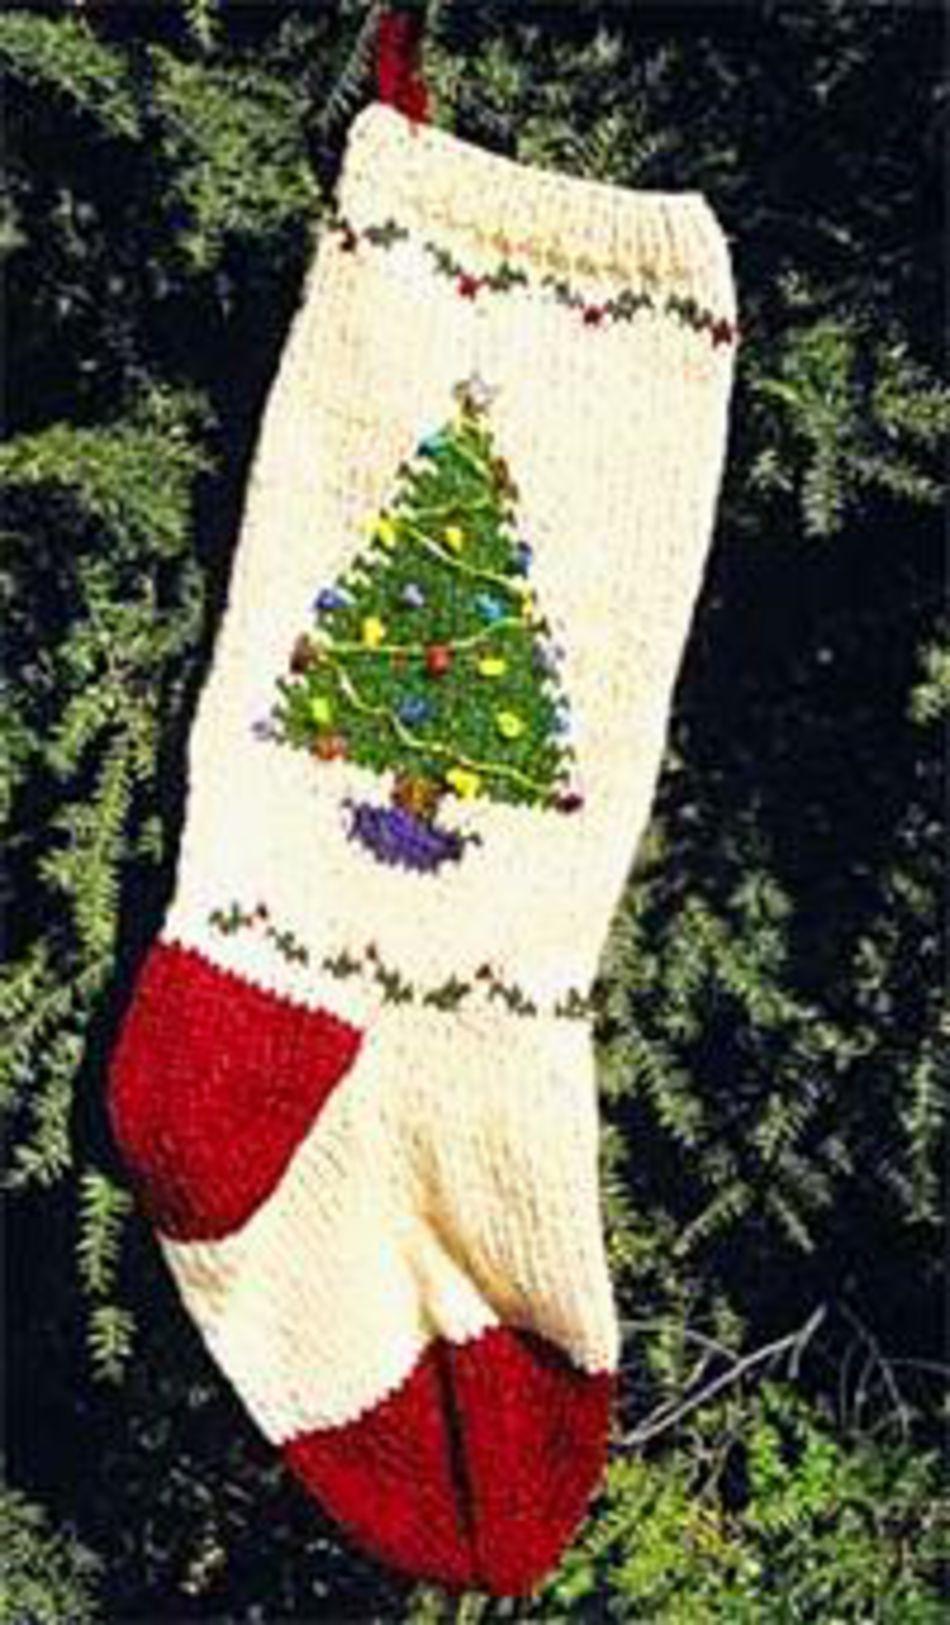 Christmas Tree Stocking Kit, Knitting Kit - Halcyon Yarn